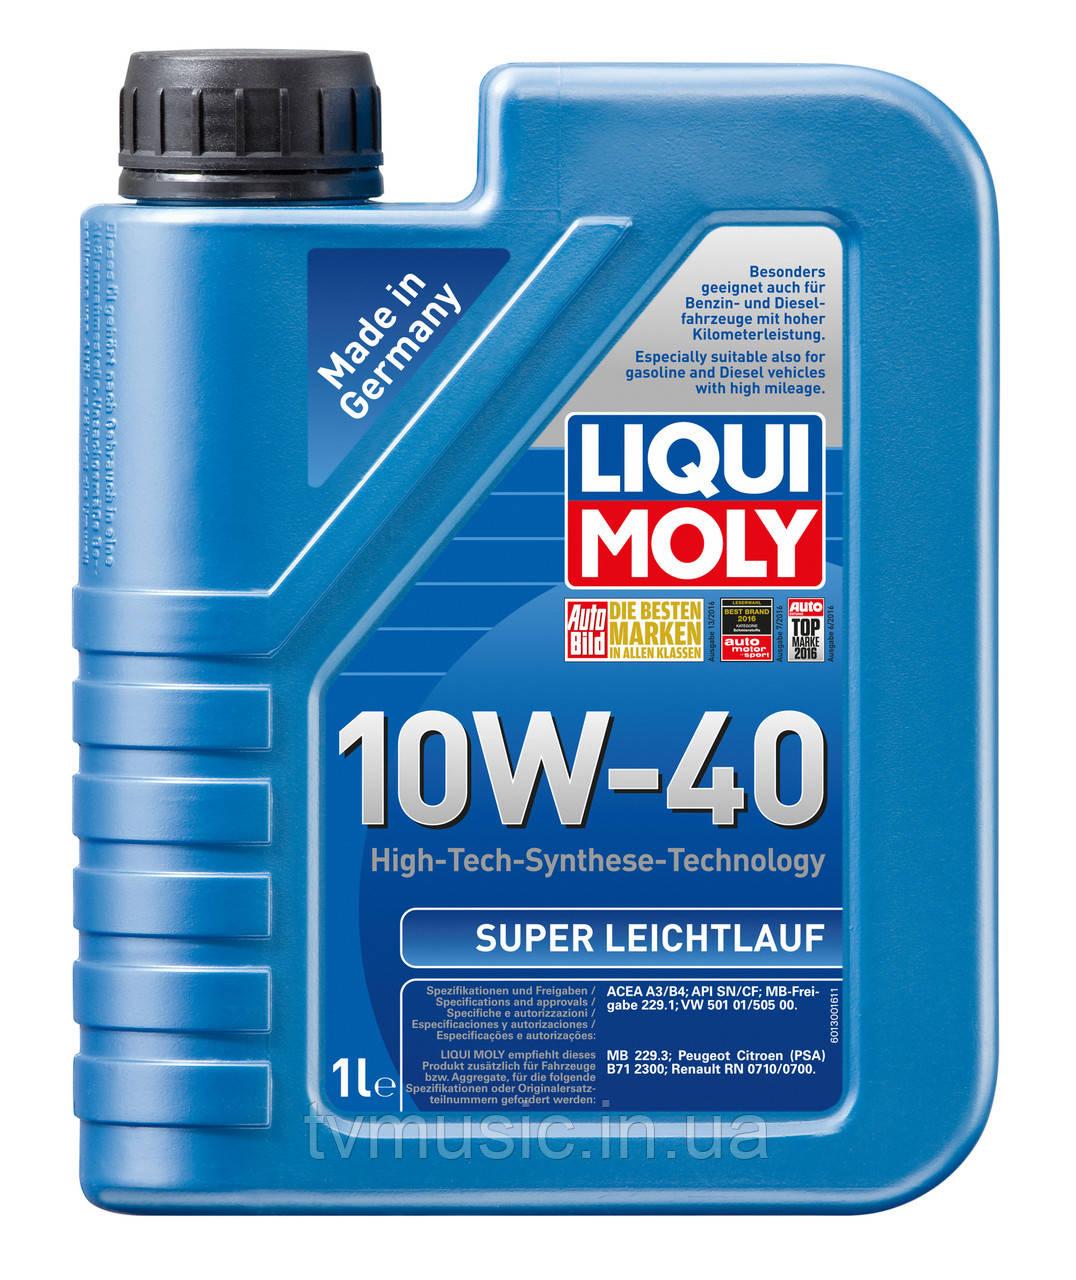 Масло моторное Liqui Moly Super Leichtlauf 10W-40 1 литр